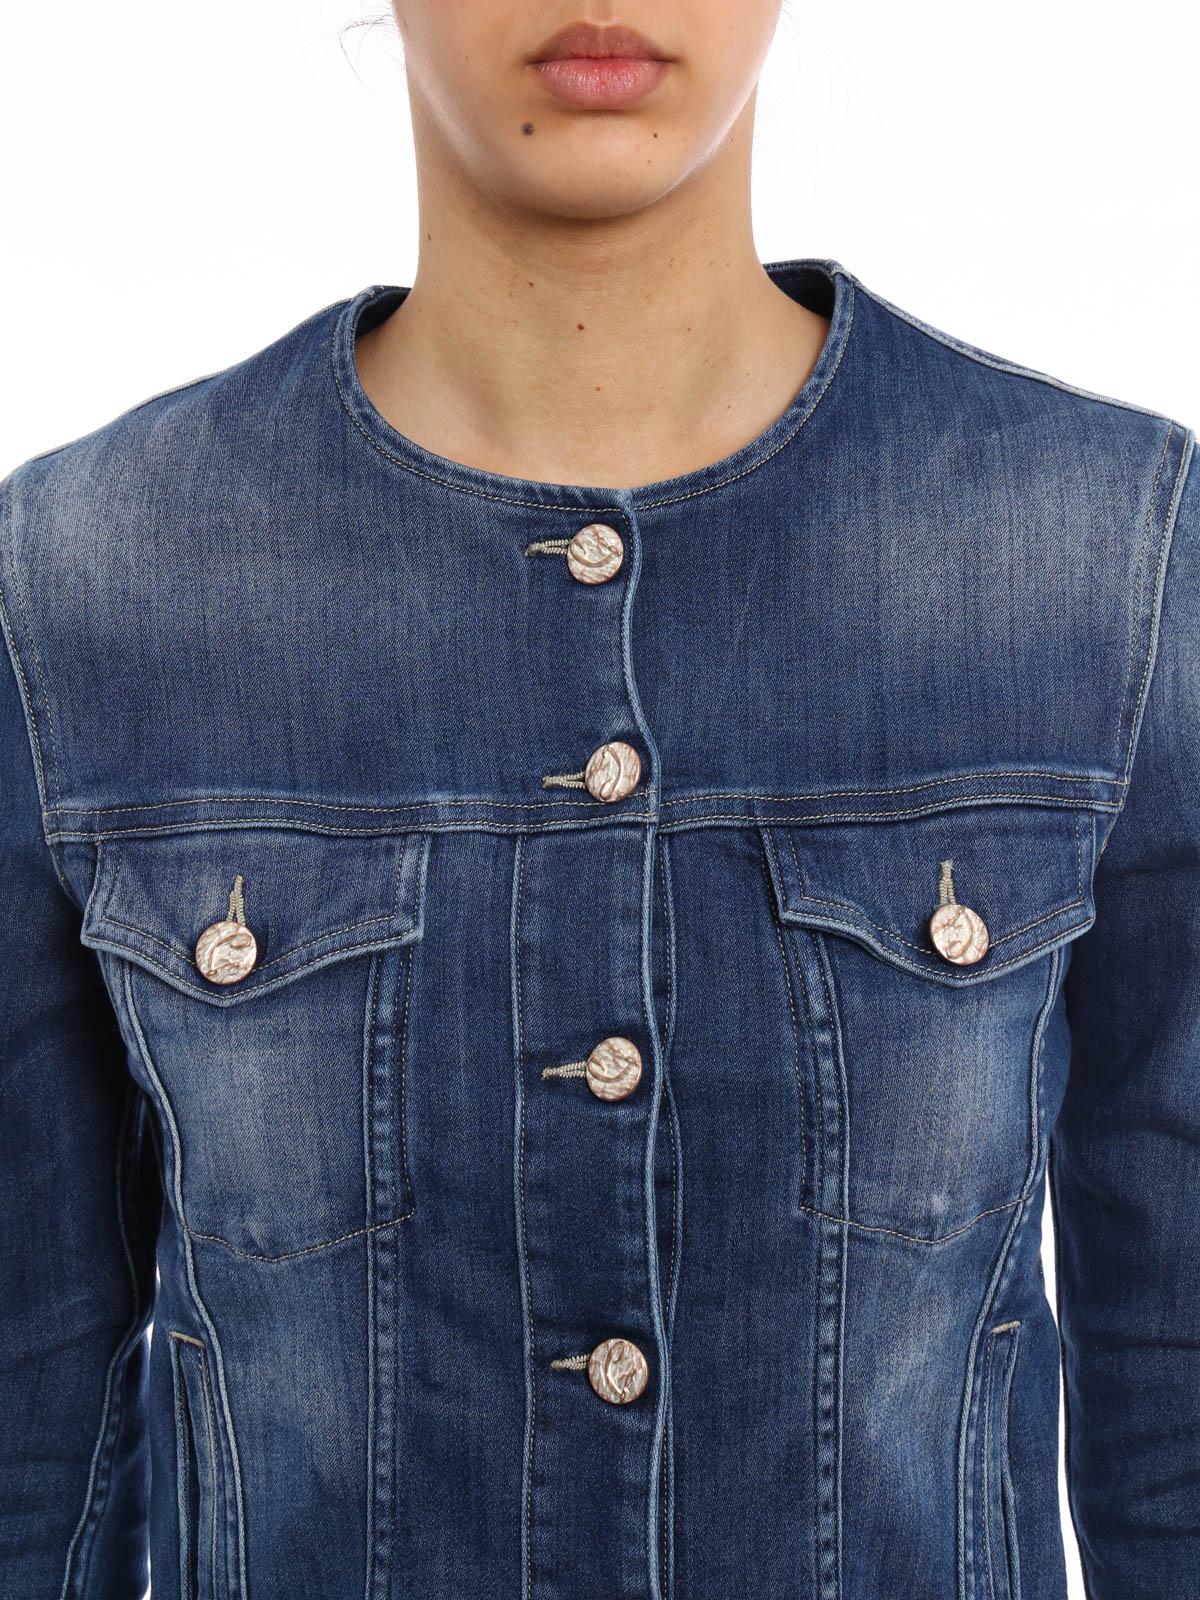 jeansjacke fur damen wash von jacob cohen jeansjacken ikrix. Black Bedroom Furniture Sets. Home Design Ideas